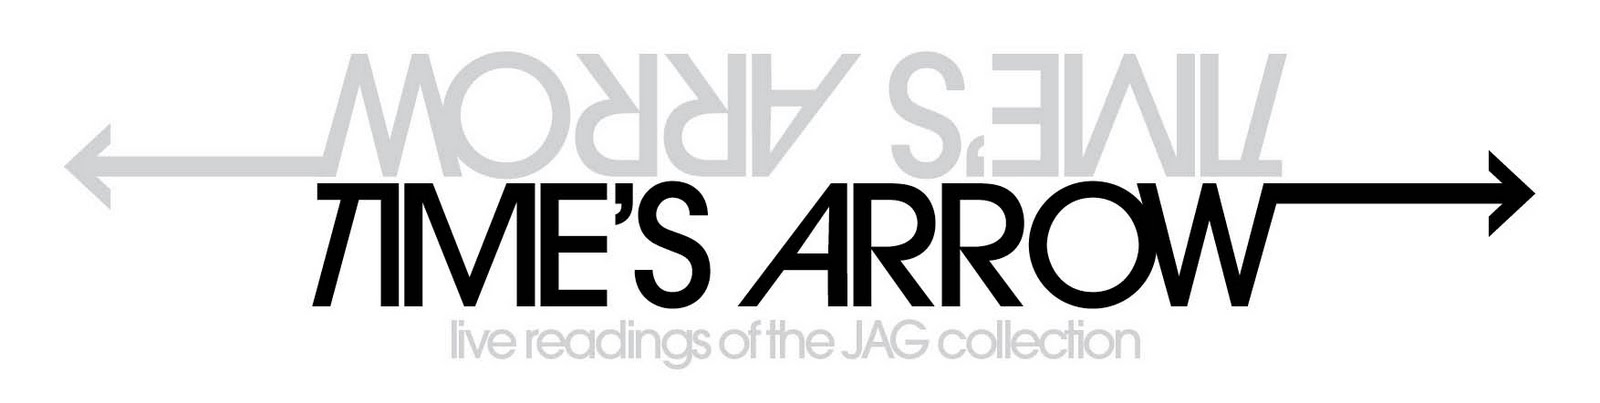 Times Arrow_title logo.jpg